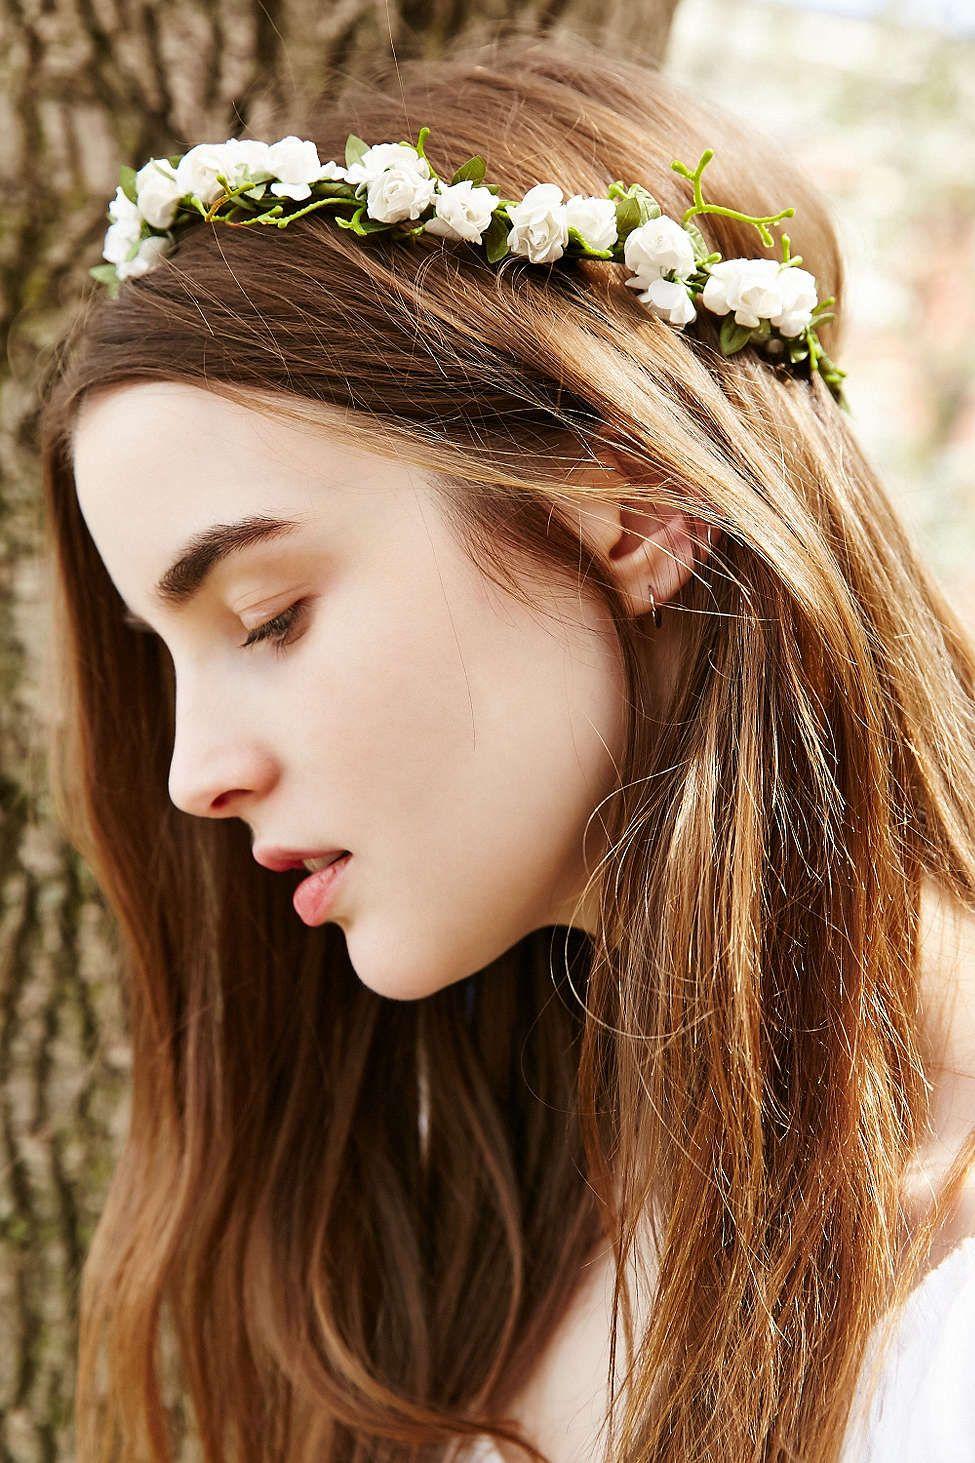 Grace Flower Crown Urban Outfitters Femme Pinterest Flower